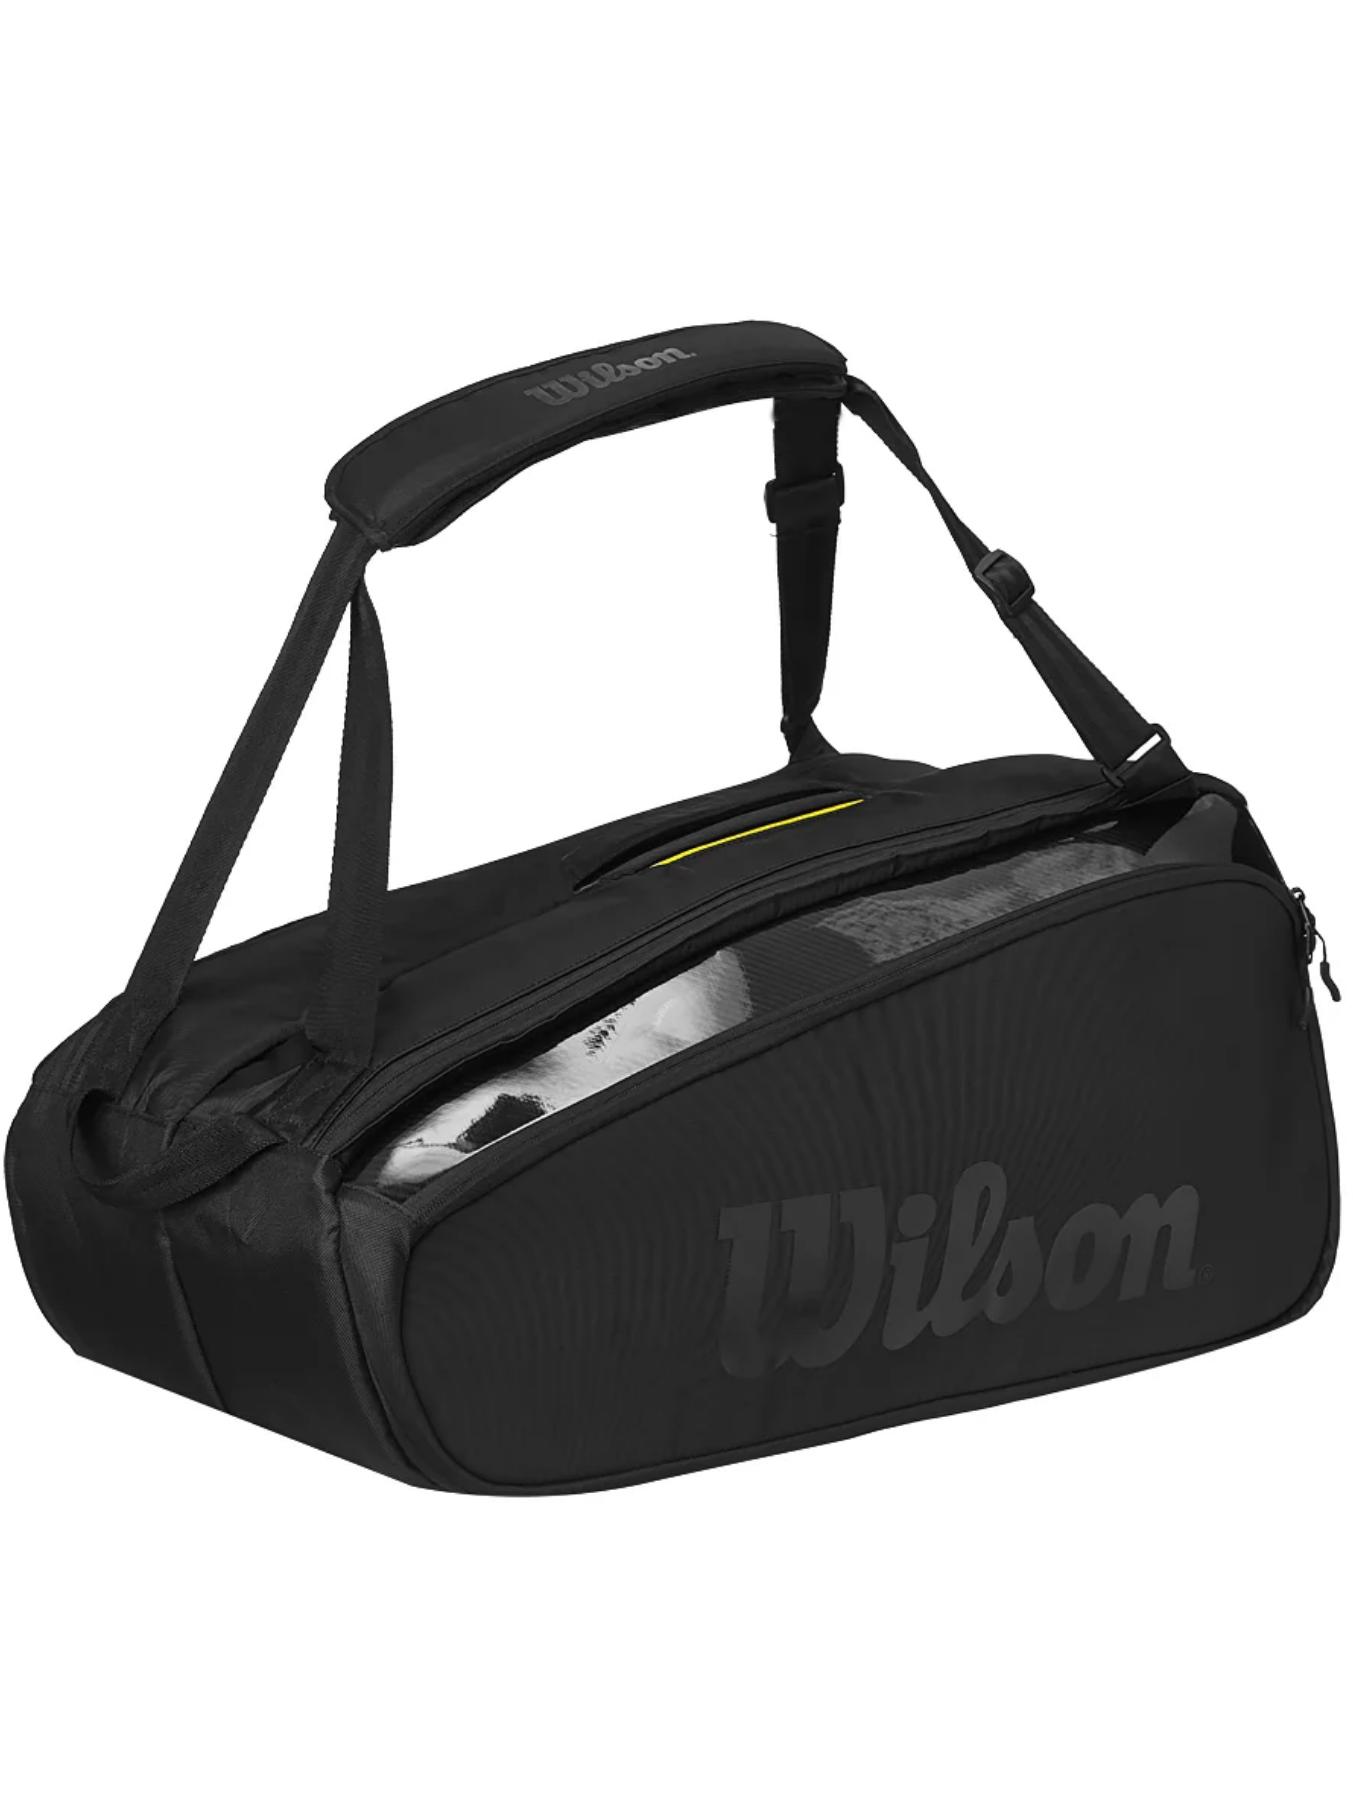 Wilson Super Tour 9 PK Pro Staff Black Bag